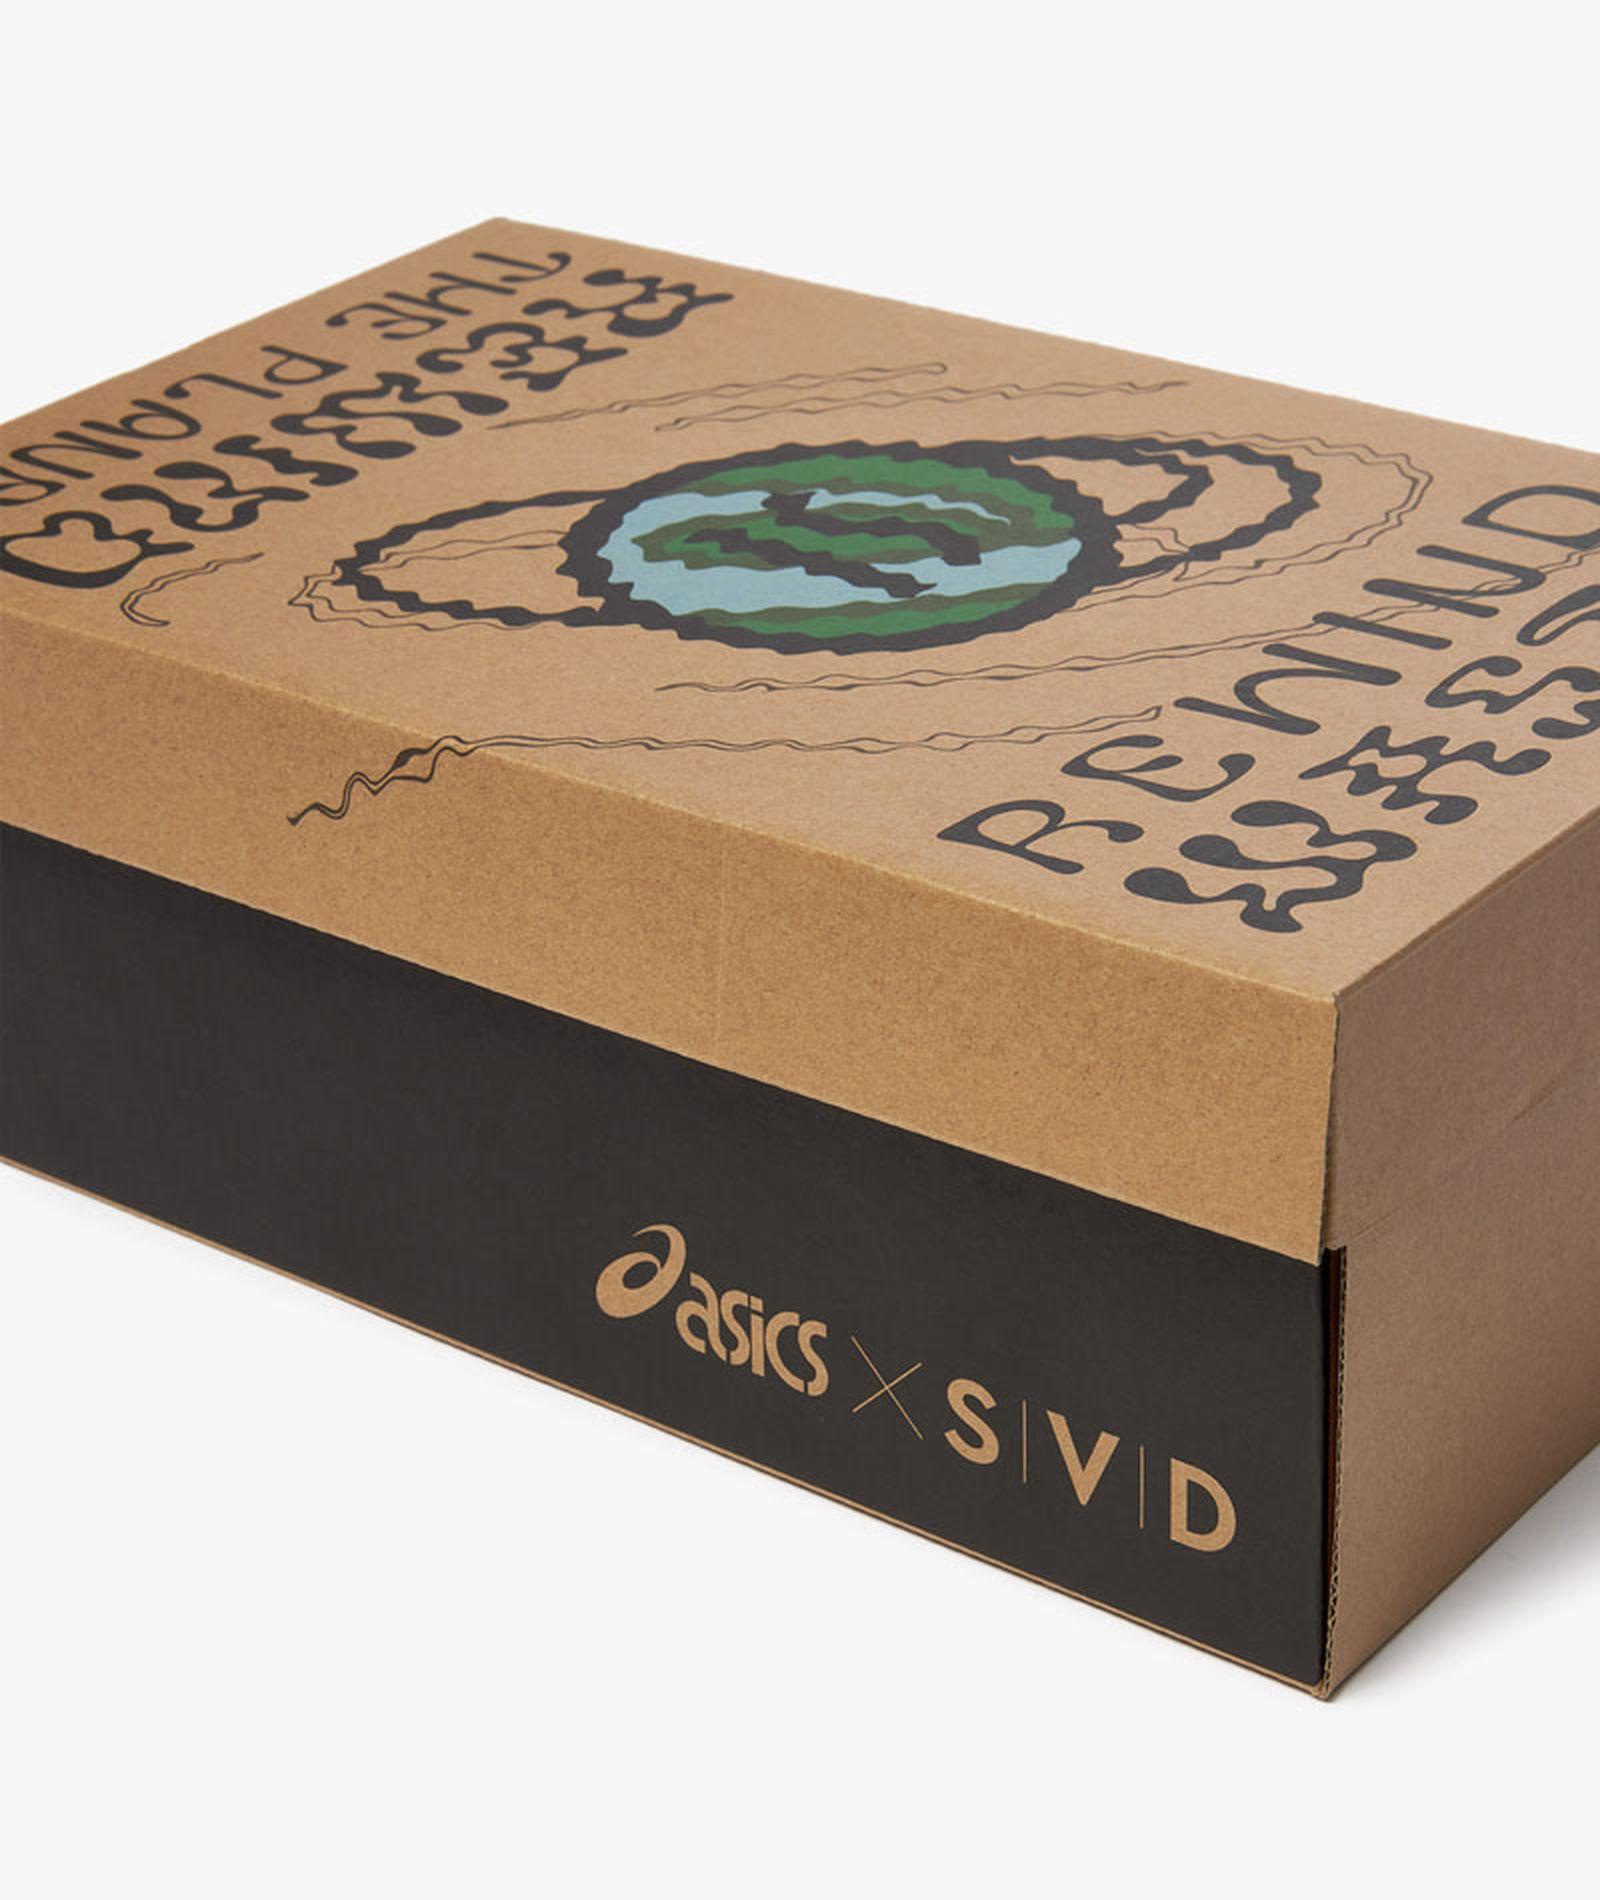 sivasdescalzo-asics-gel-lyte-3-release-date-price-01